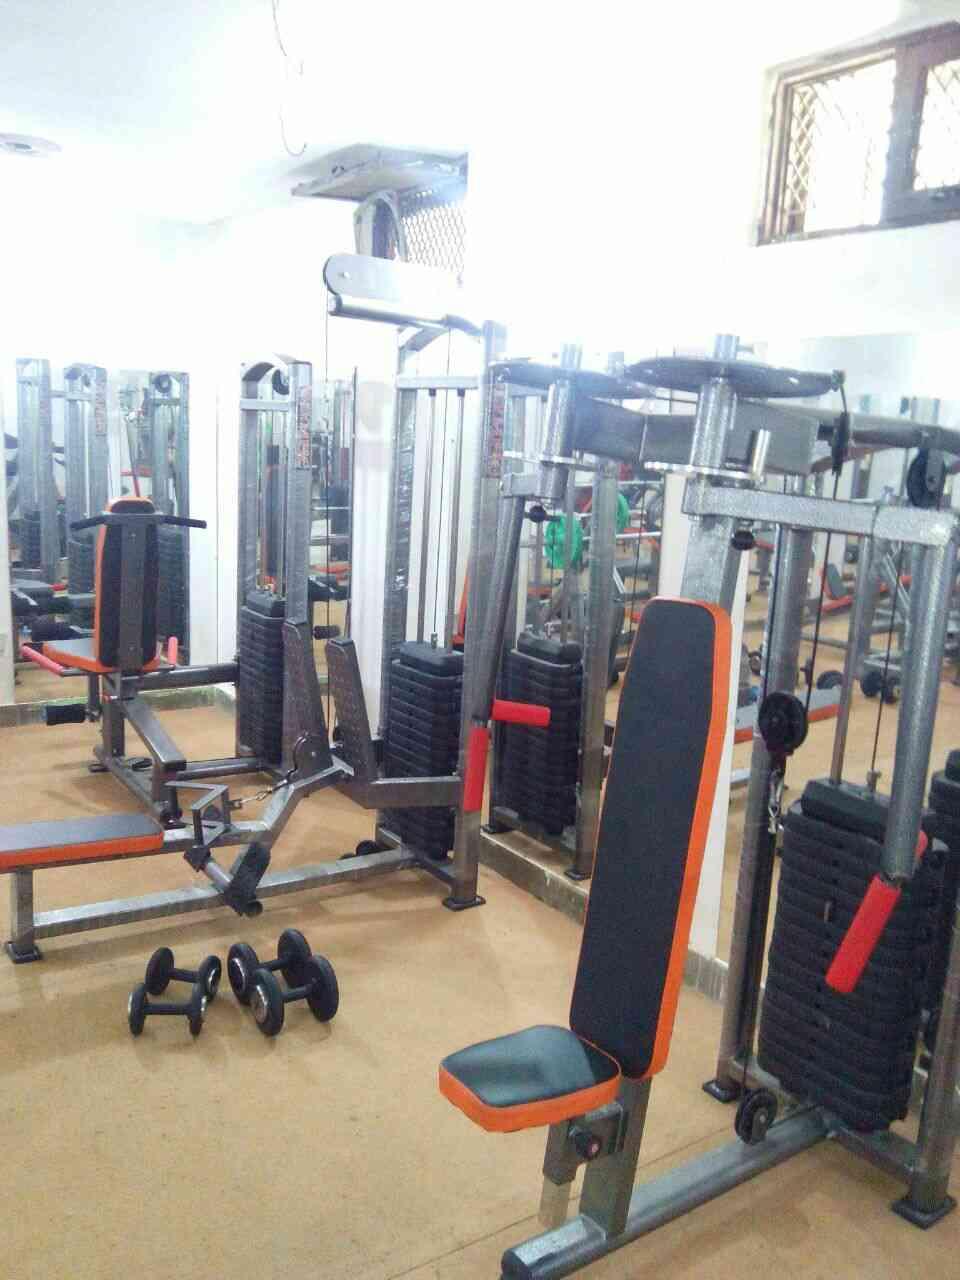 manufacturer of Gym equipment in Delhi. we provides commercial Gym equipment and commercial cardio equipment system